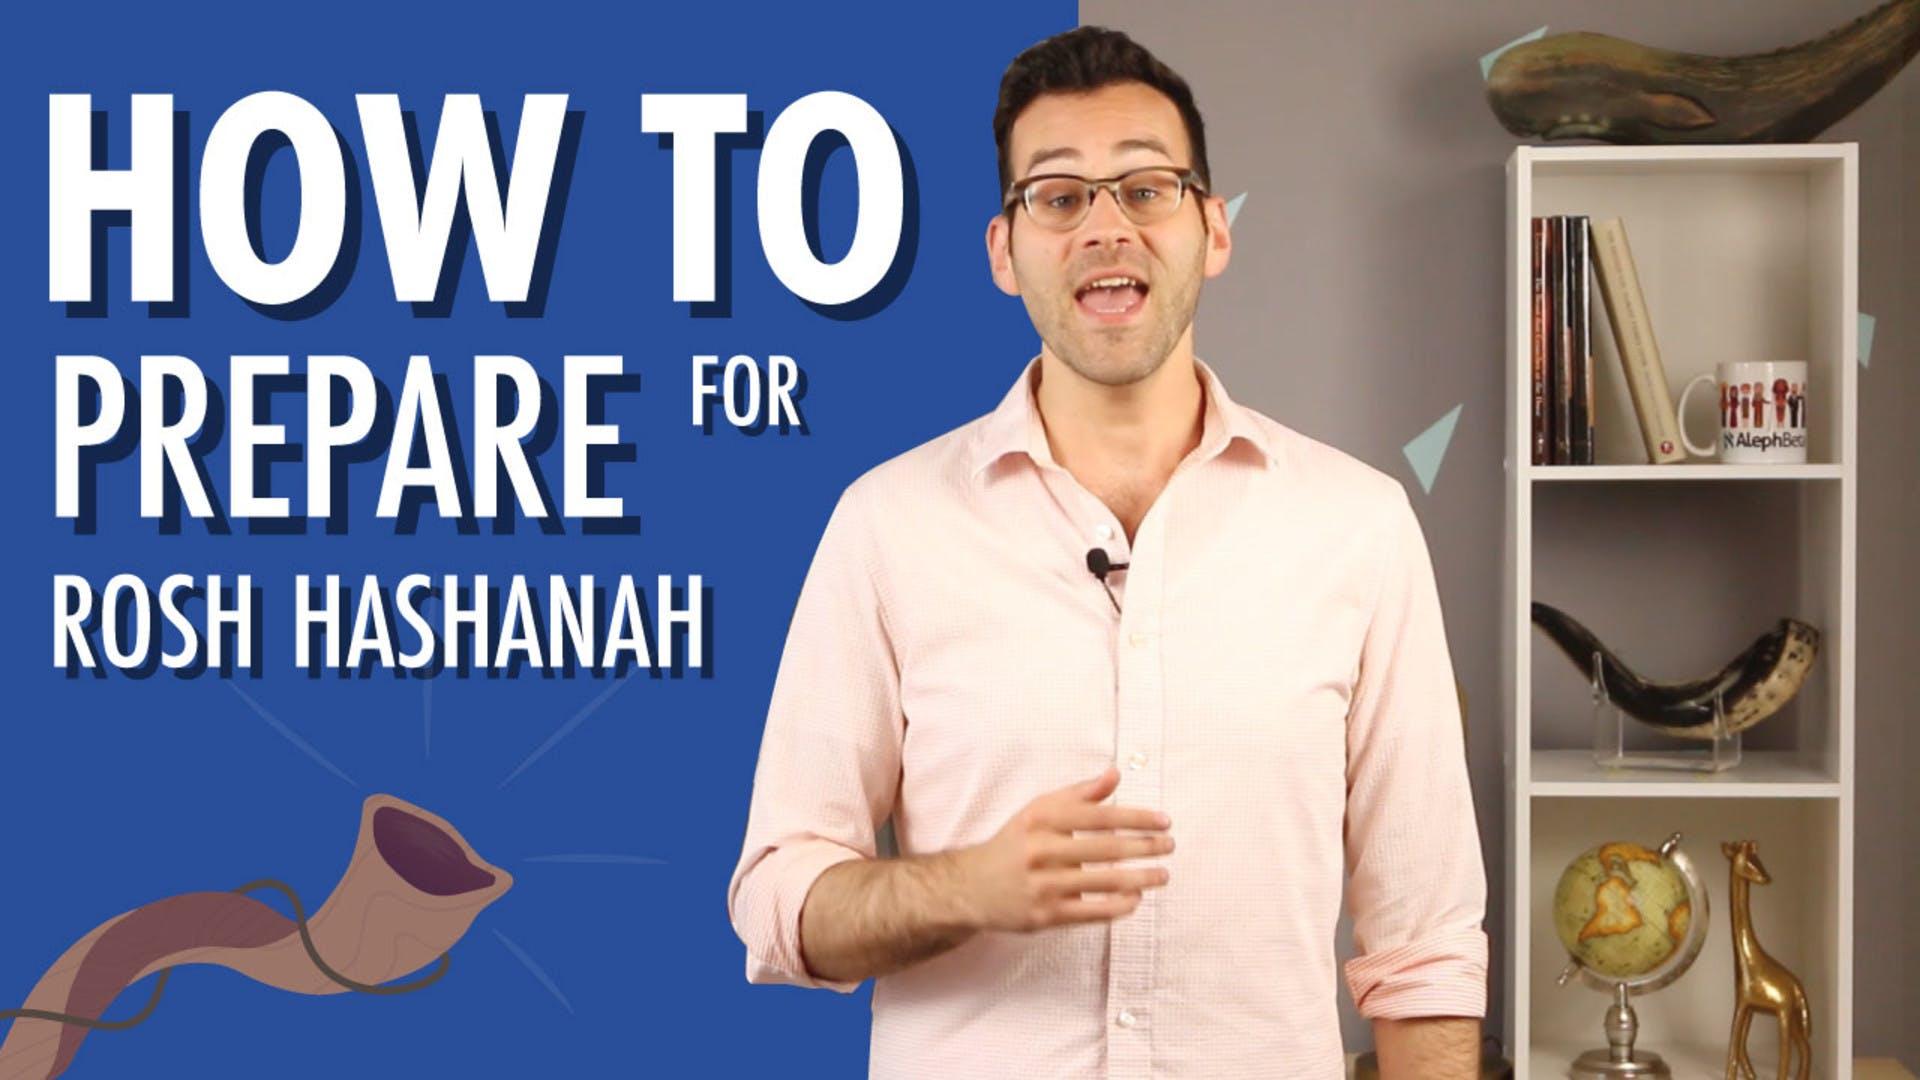 Why we celebrate Rosh Hashanah